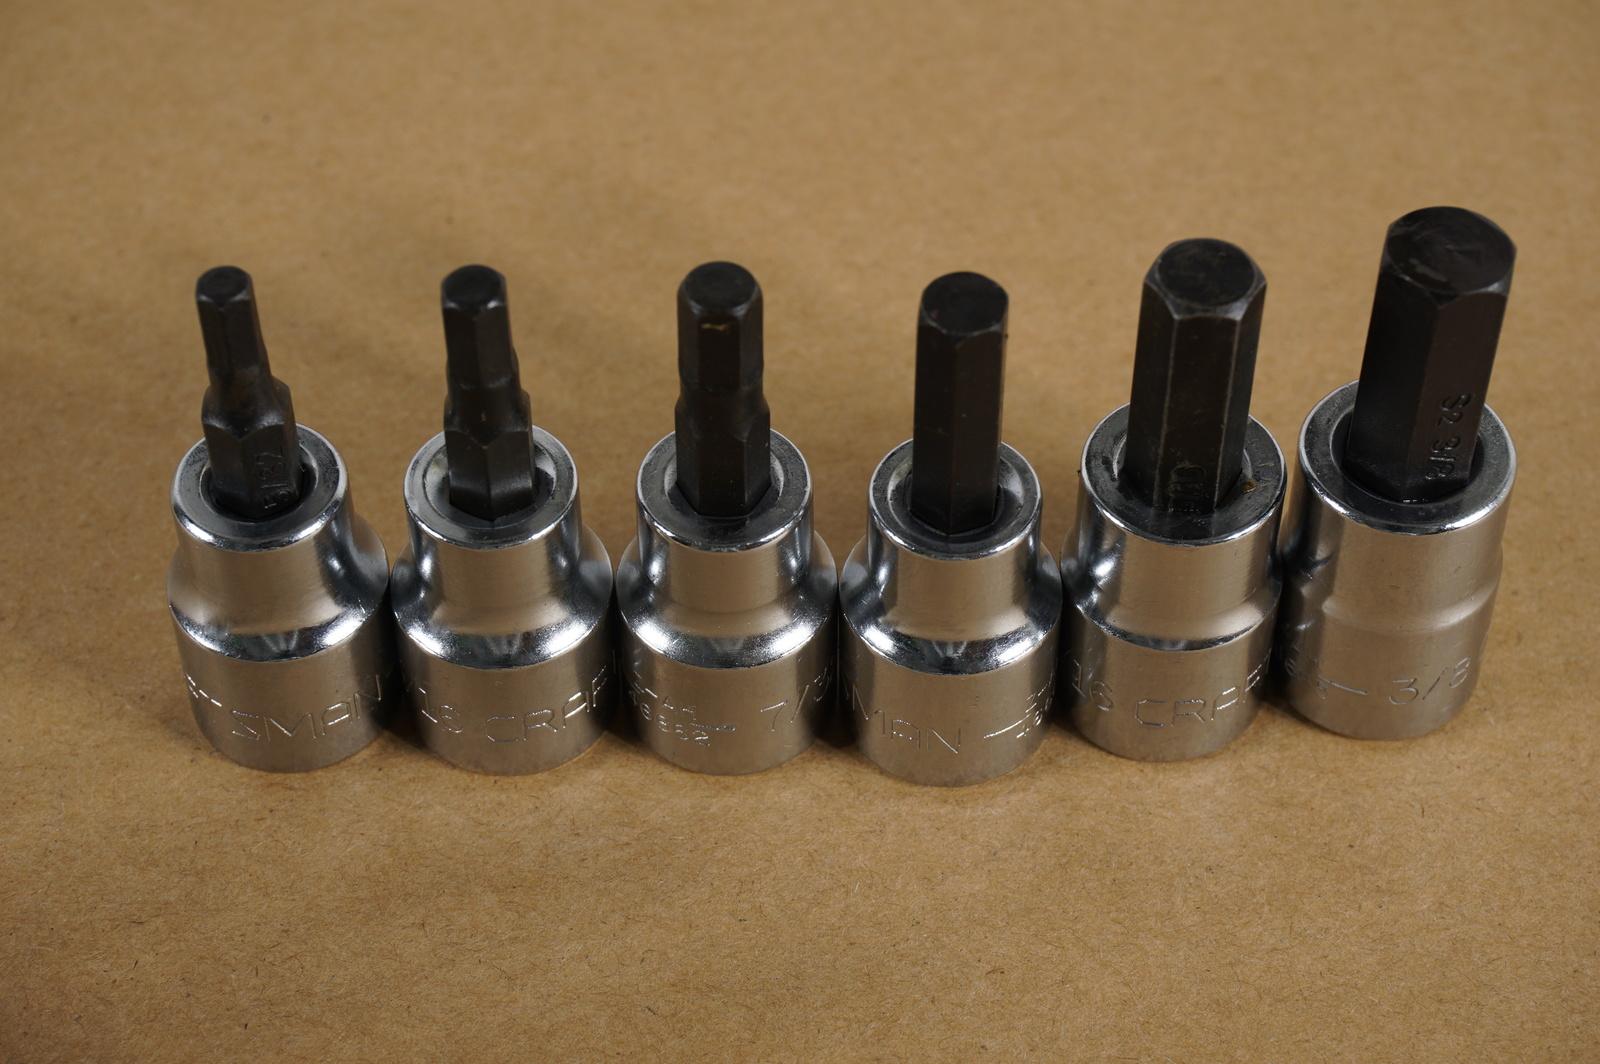 Star bit ratchet wrench socket set CRAFTSMAN HAND TOOLS 7pc LOT External Torx